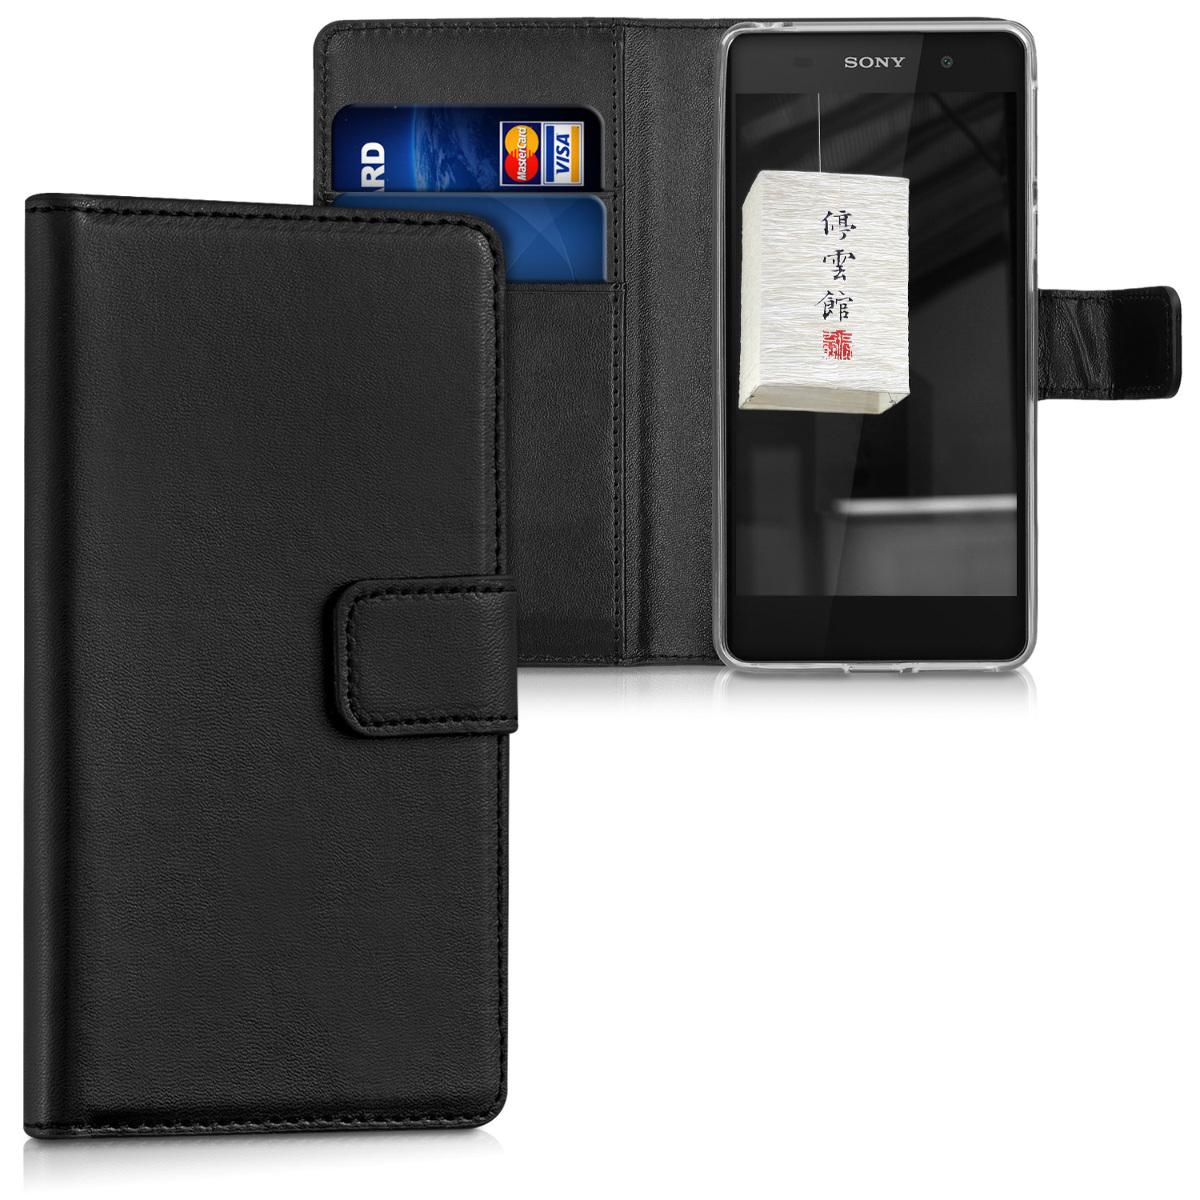 KW Θήκη - Πορτοφόλι Sony Xperia E5 - Black (38783.01)